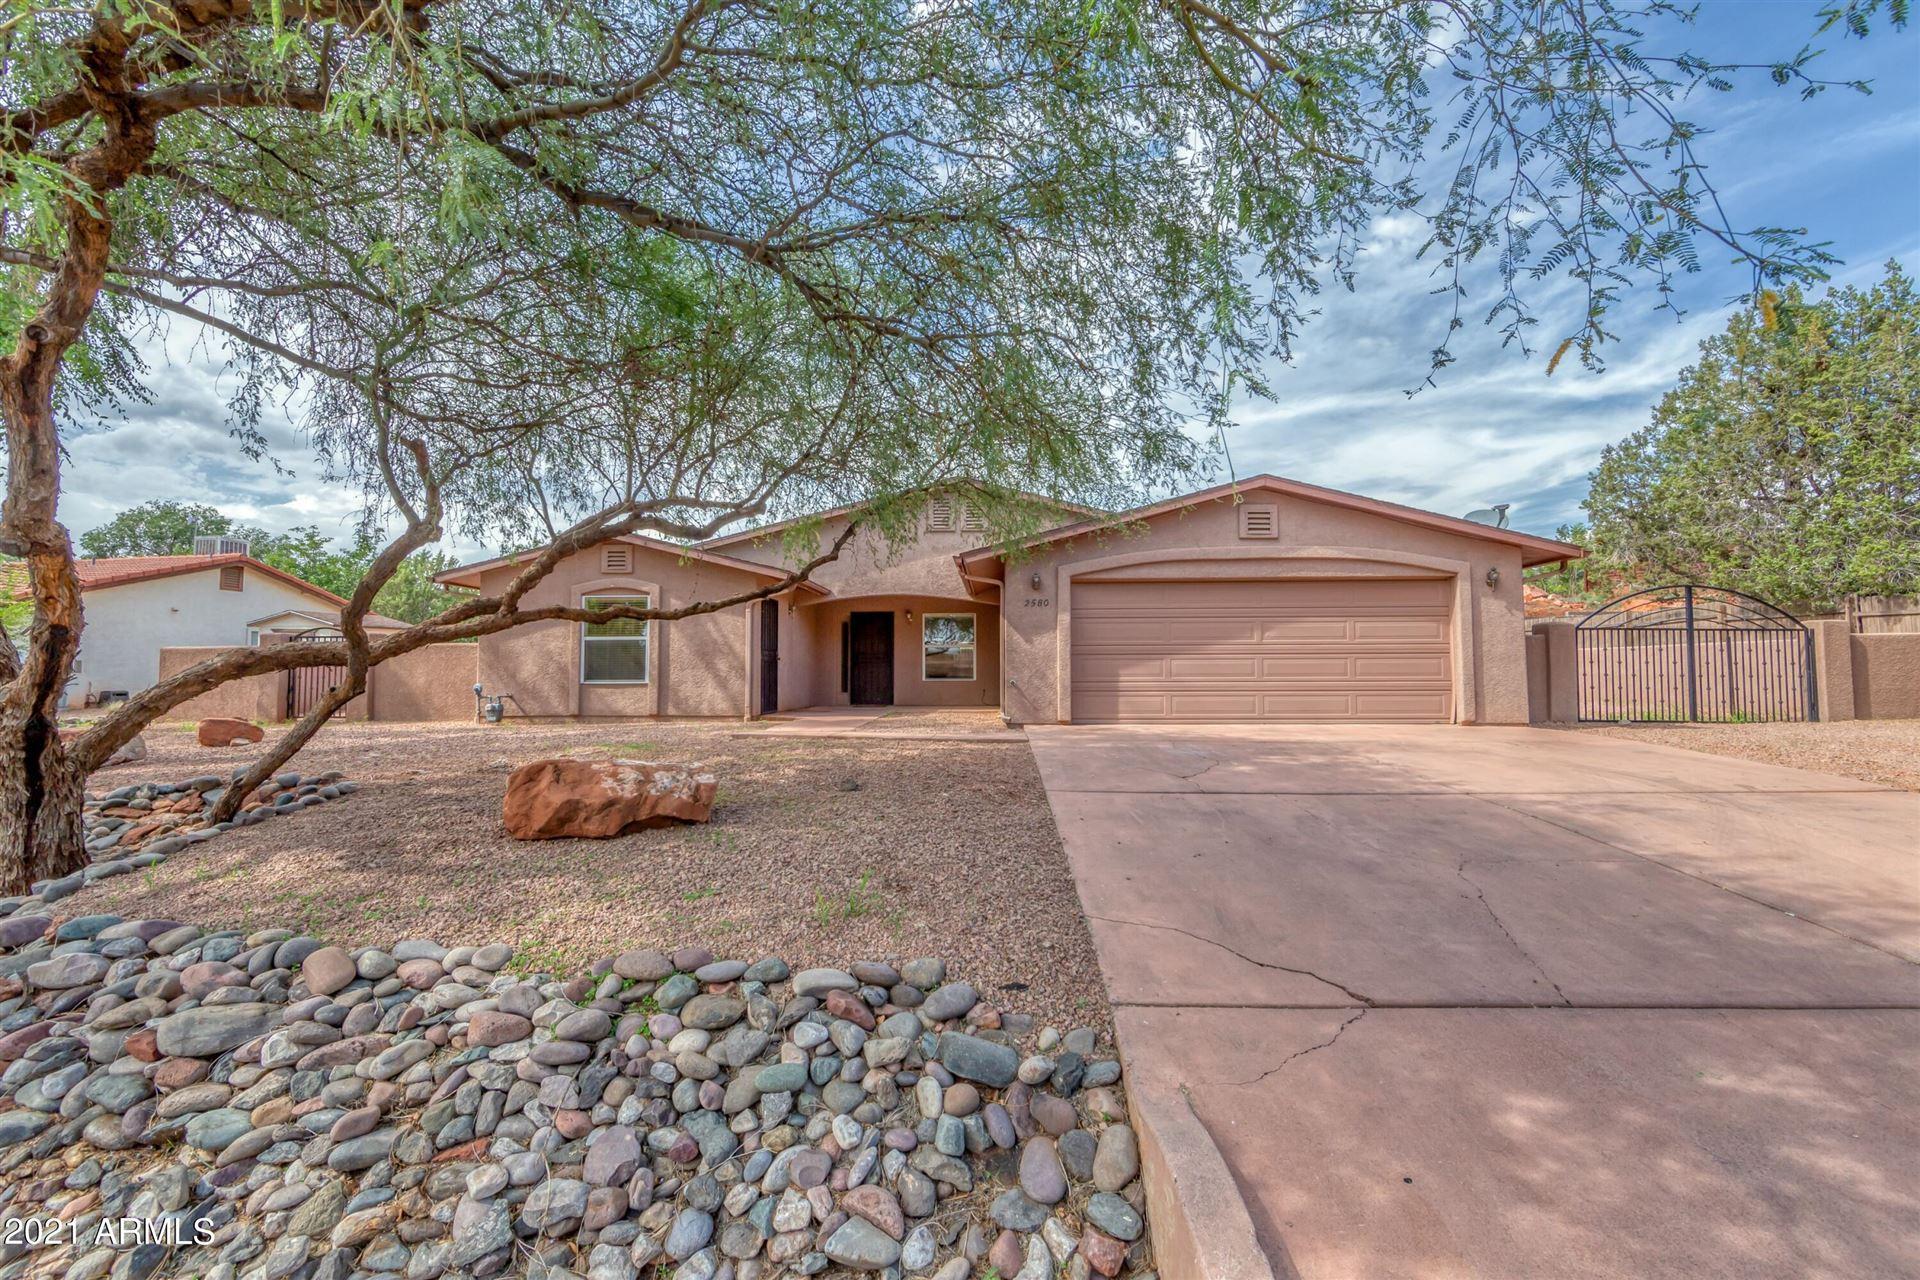 2580 WHIPPET Way, Sedona, AZ 86336 - MLS#: 6278700